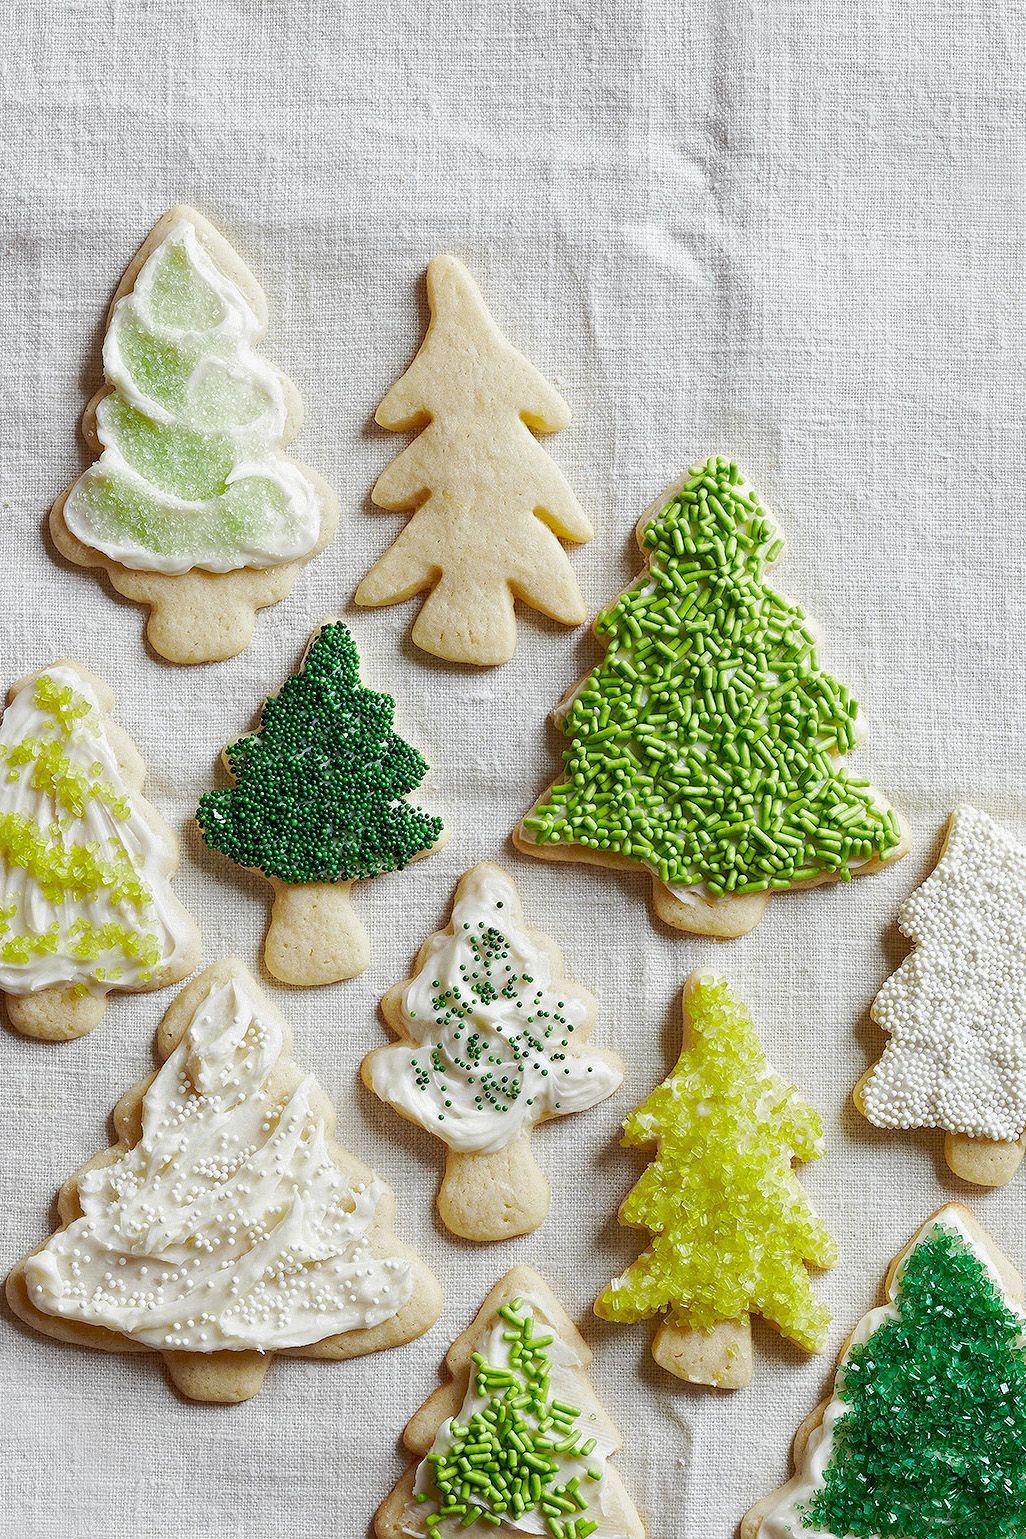 32 All Time Favorite Christmas Cookie Recipes Christmas Spritz Cookies Christmas Sugar Cookies Cookies Recipes Christmas